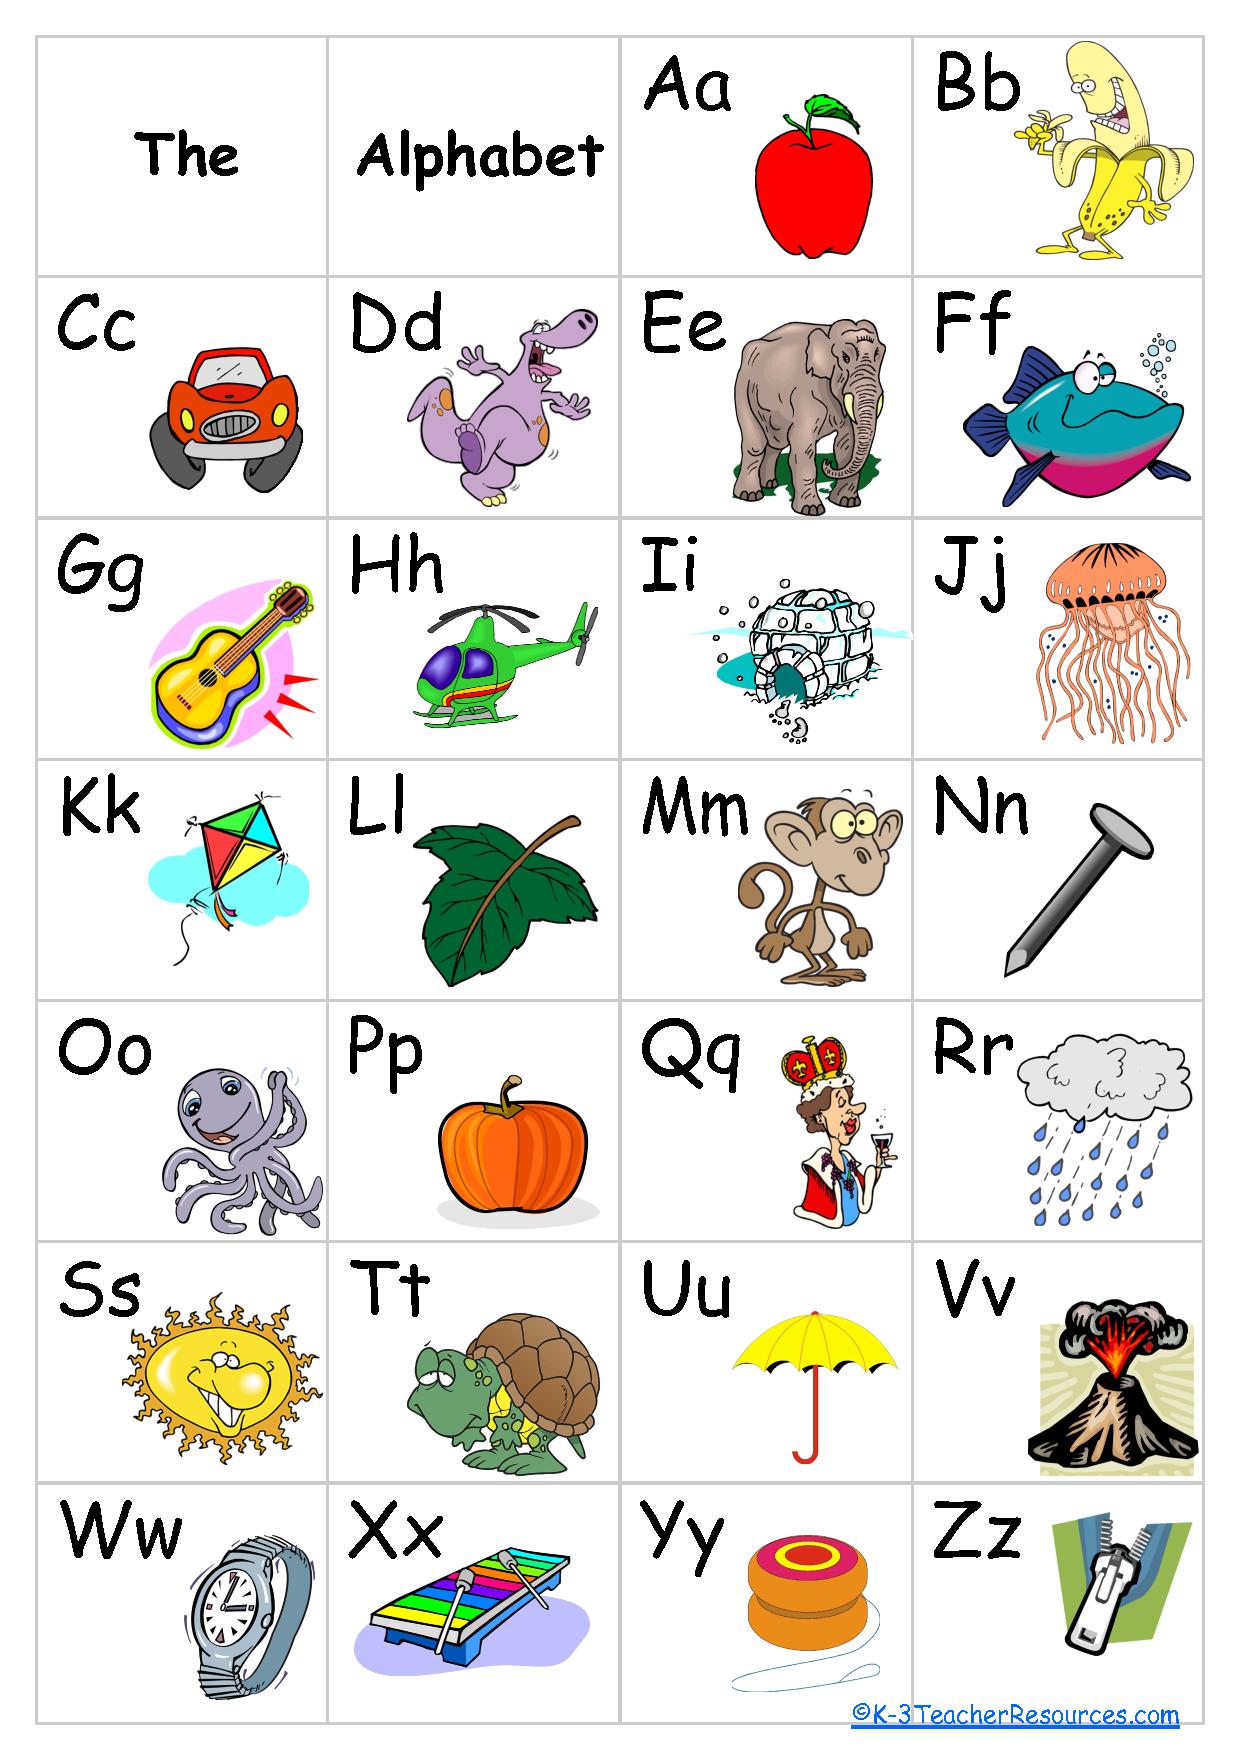 Free printable alphabet chart also schoolroom ideas rh pinterest